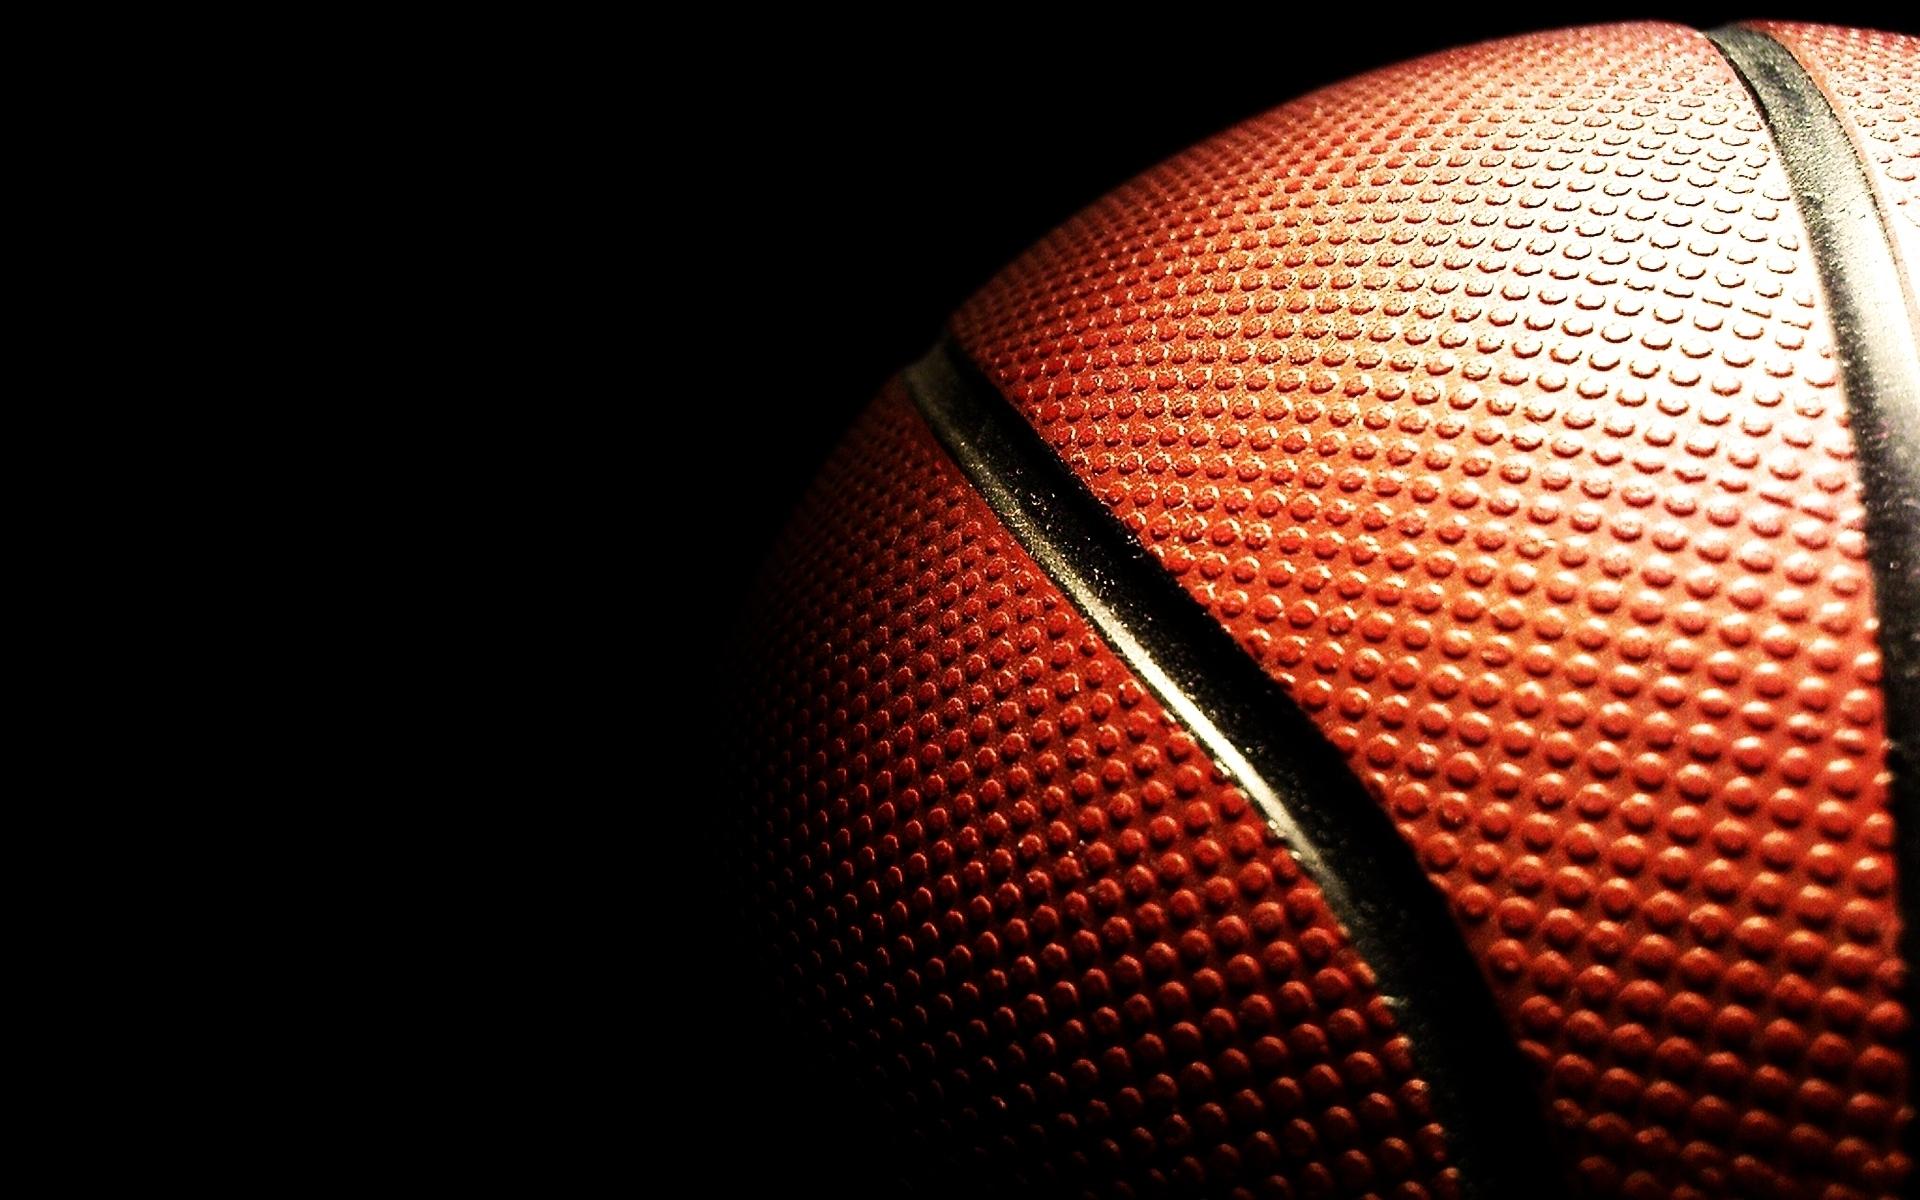 Free Download Basketball Computer Wallpapers Desktop Backgrounds